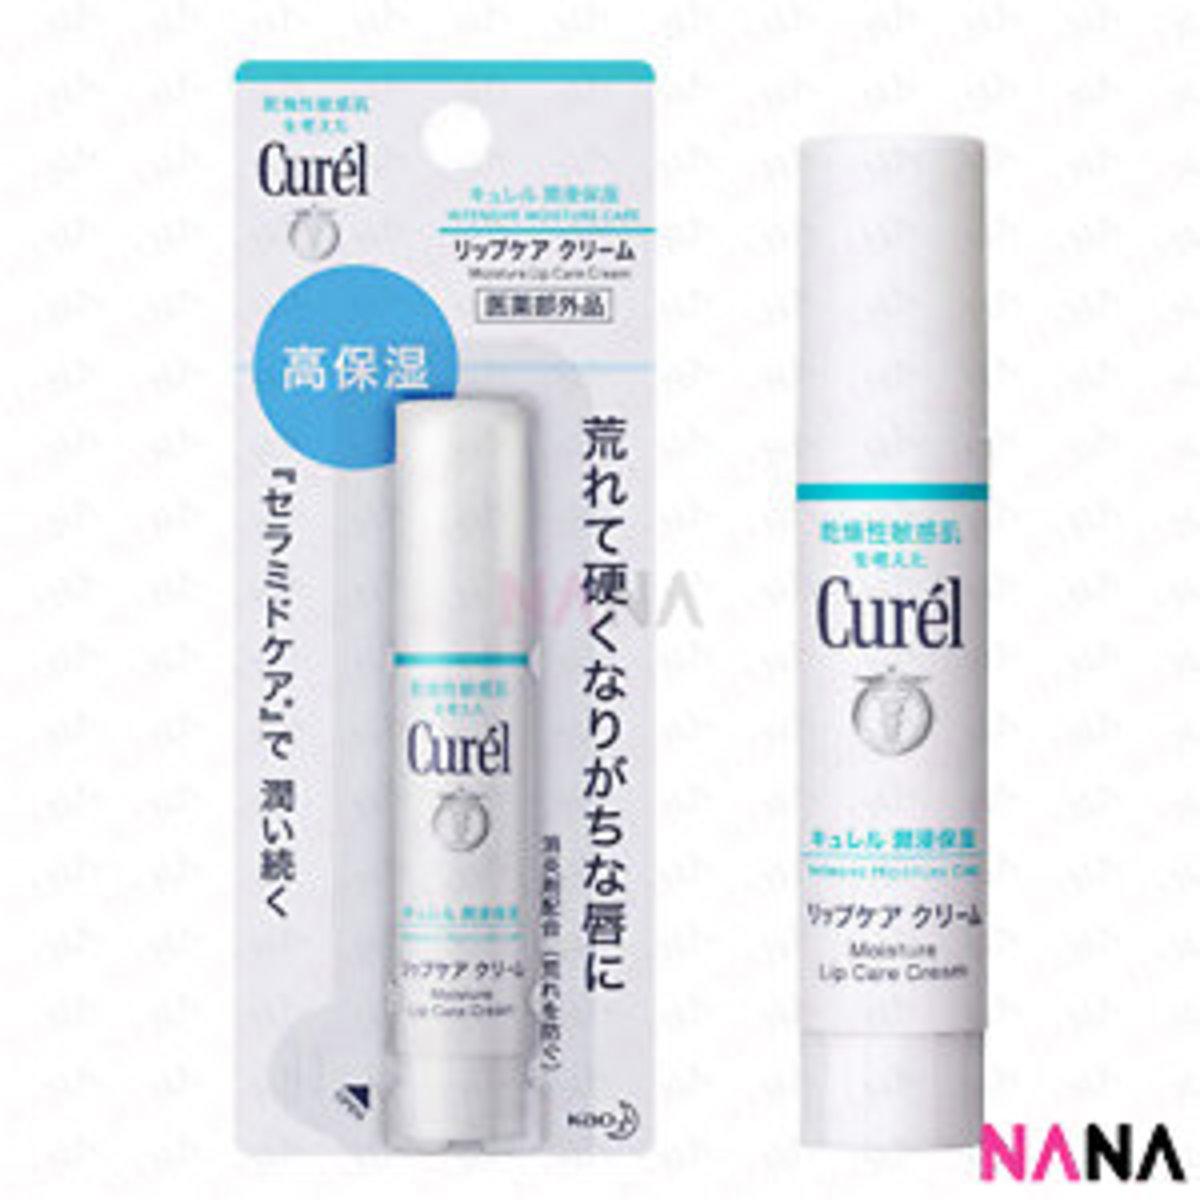 Moisture Lip Care Cream 4.2g